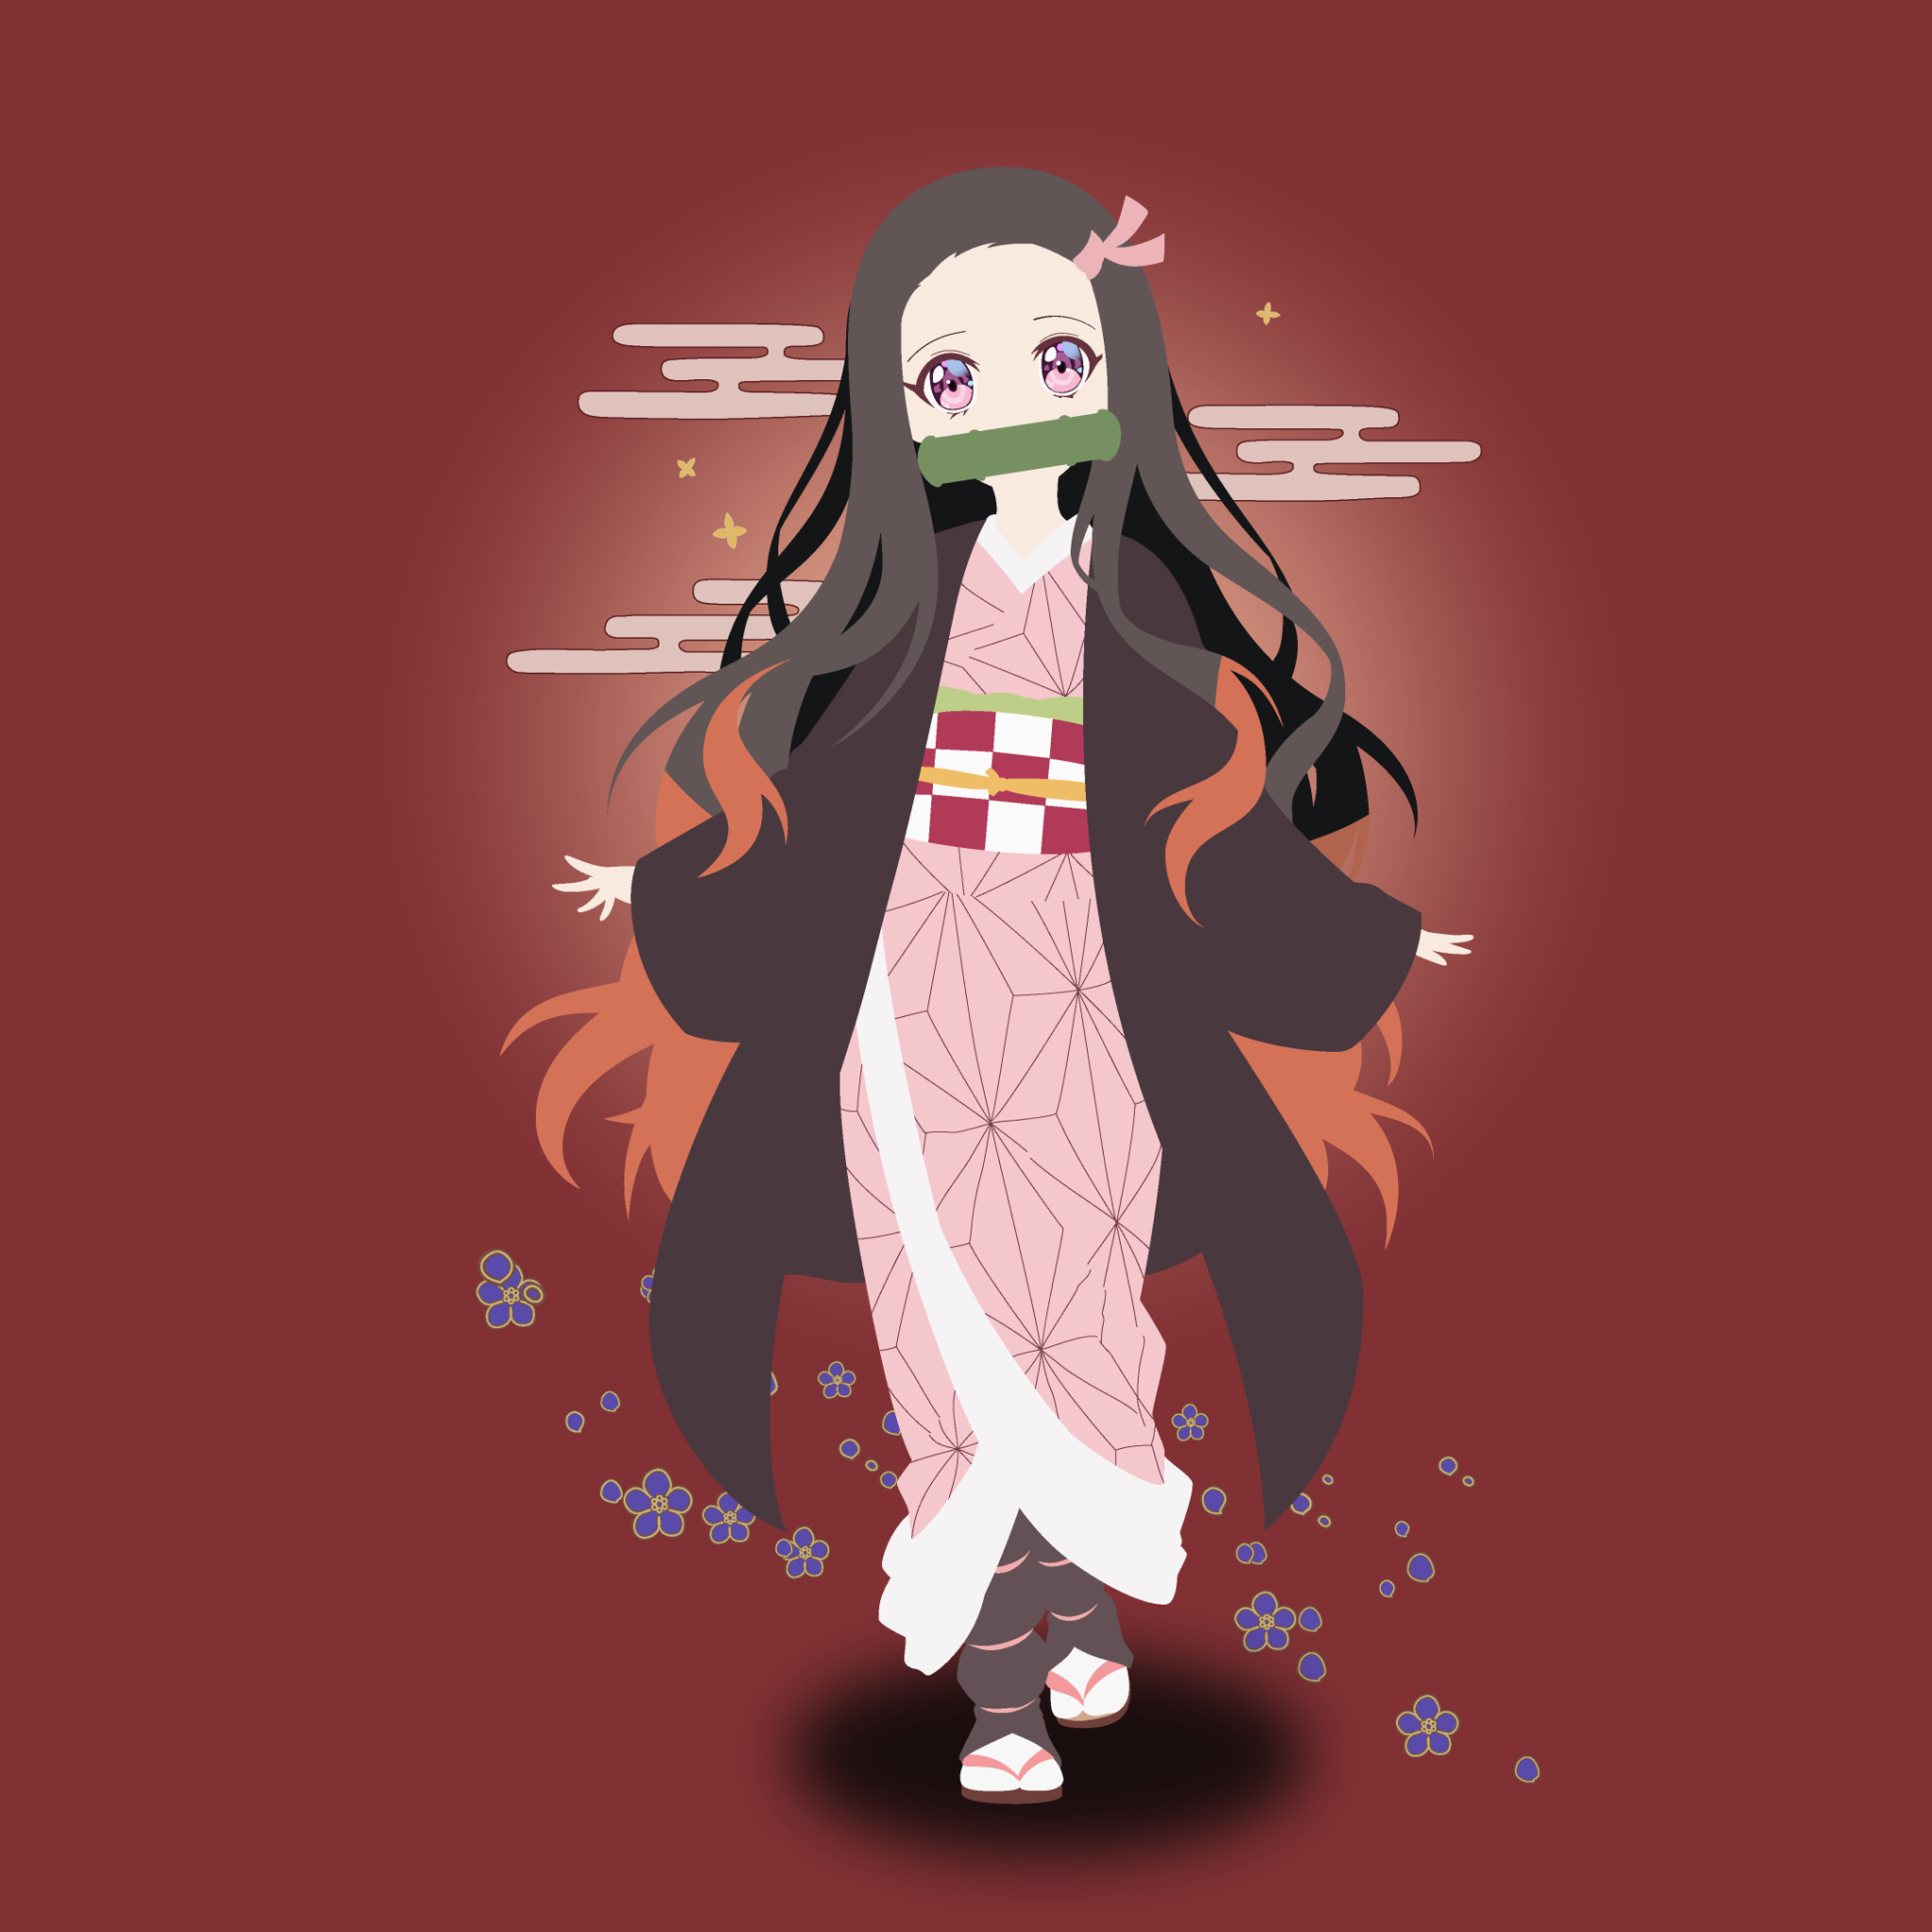 2048x2048 Nezuko Ipad Air Wallpaper, HD Anime 4K ...